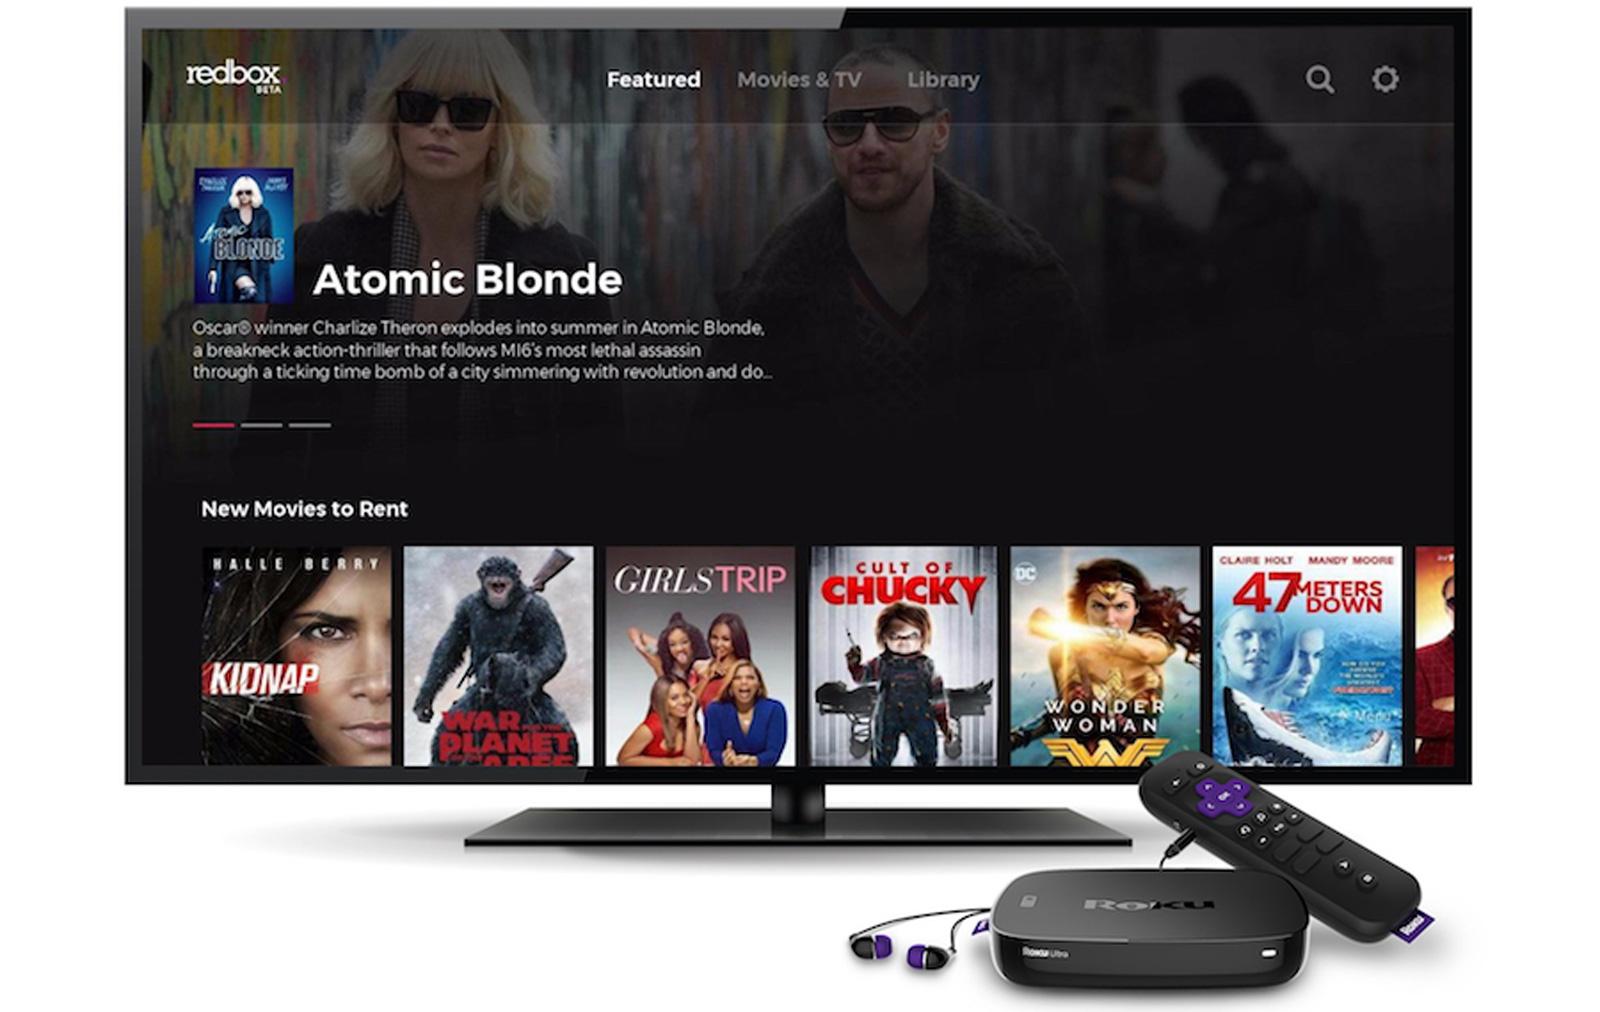 Redbox returns to internet video with On Demand service